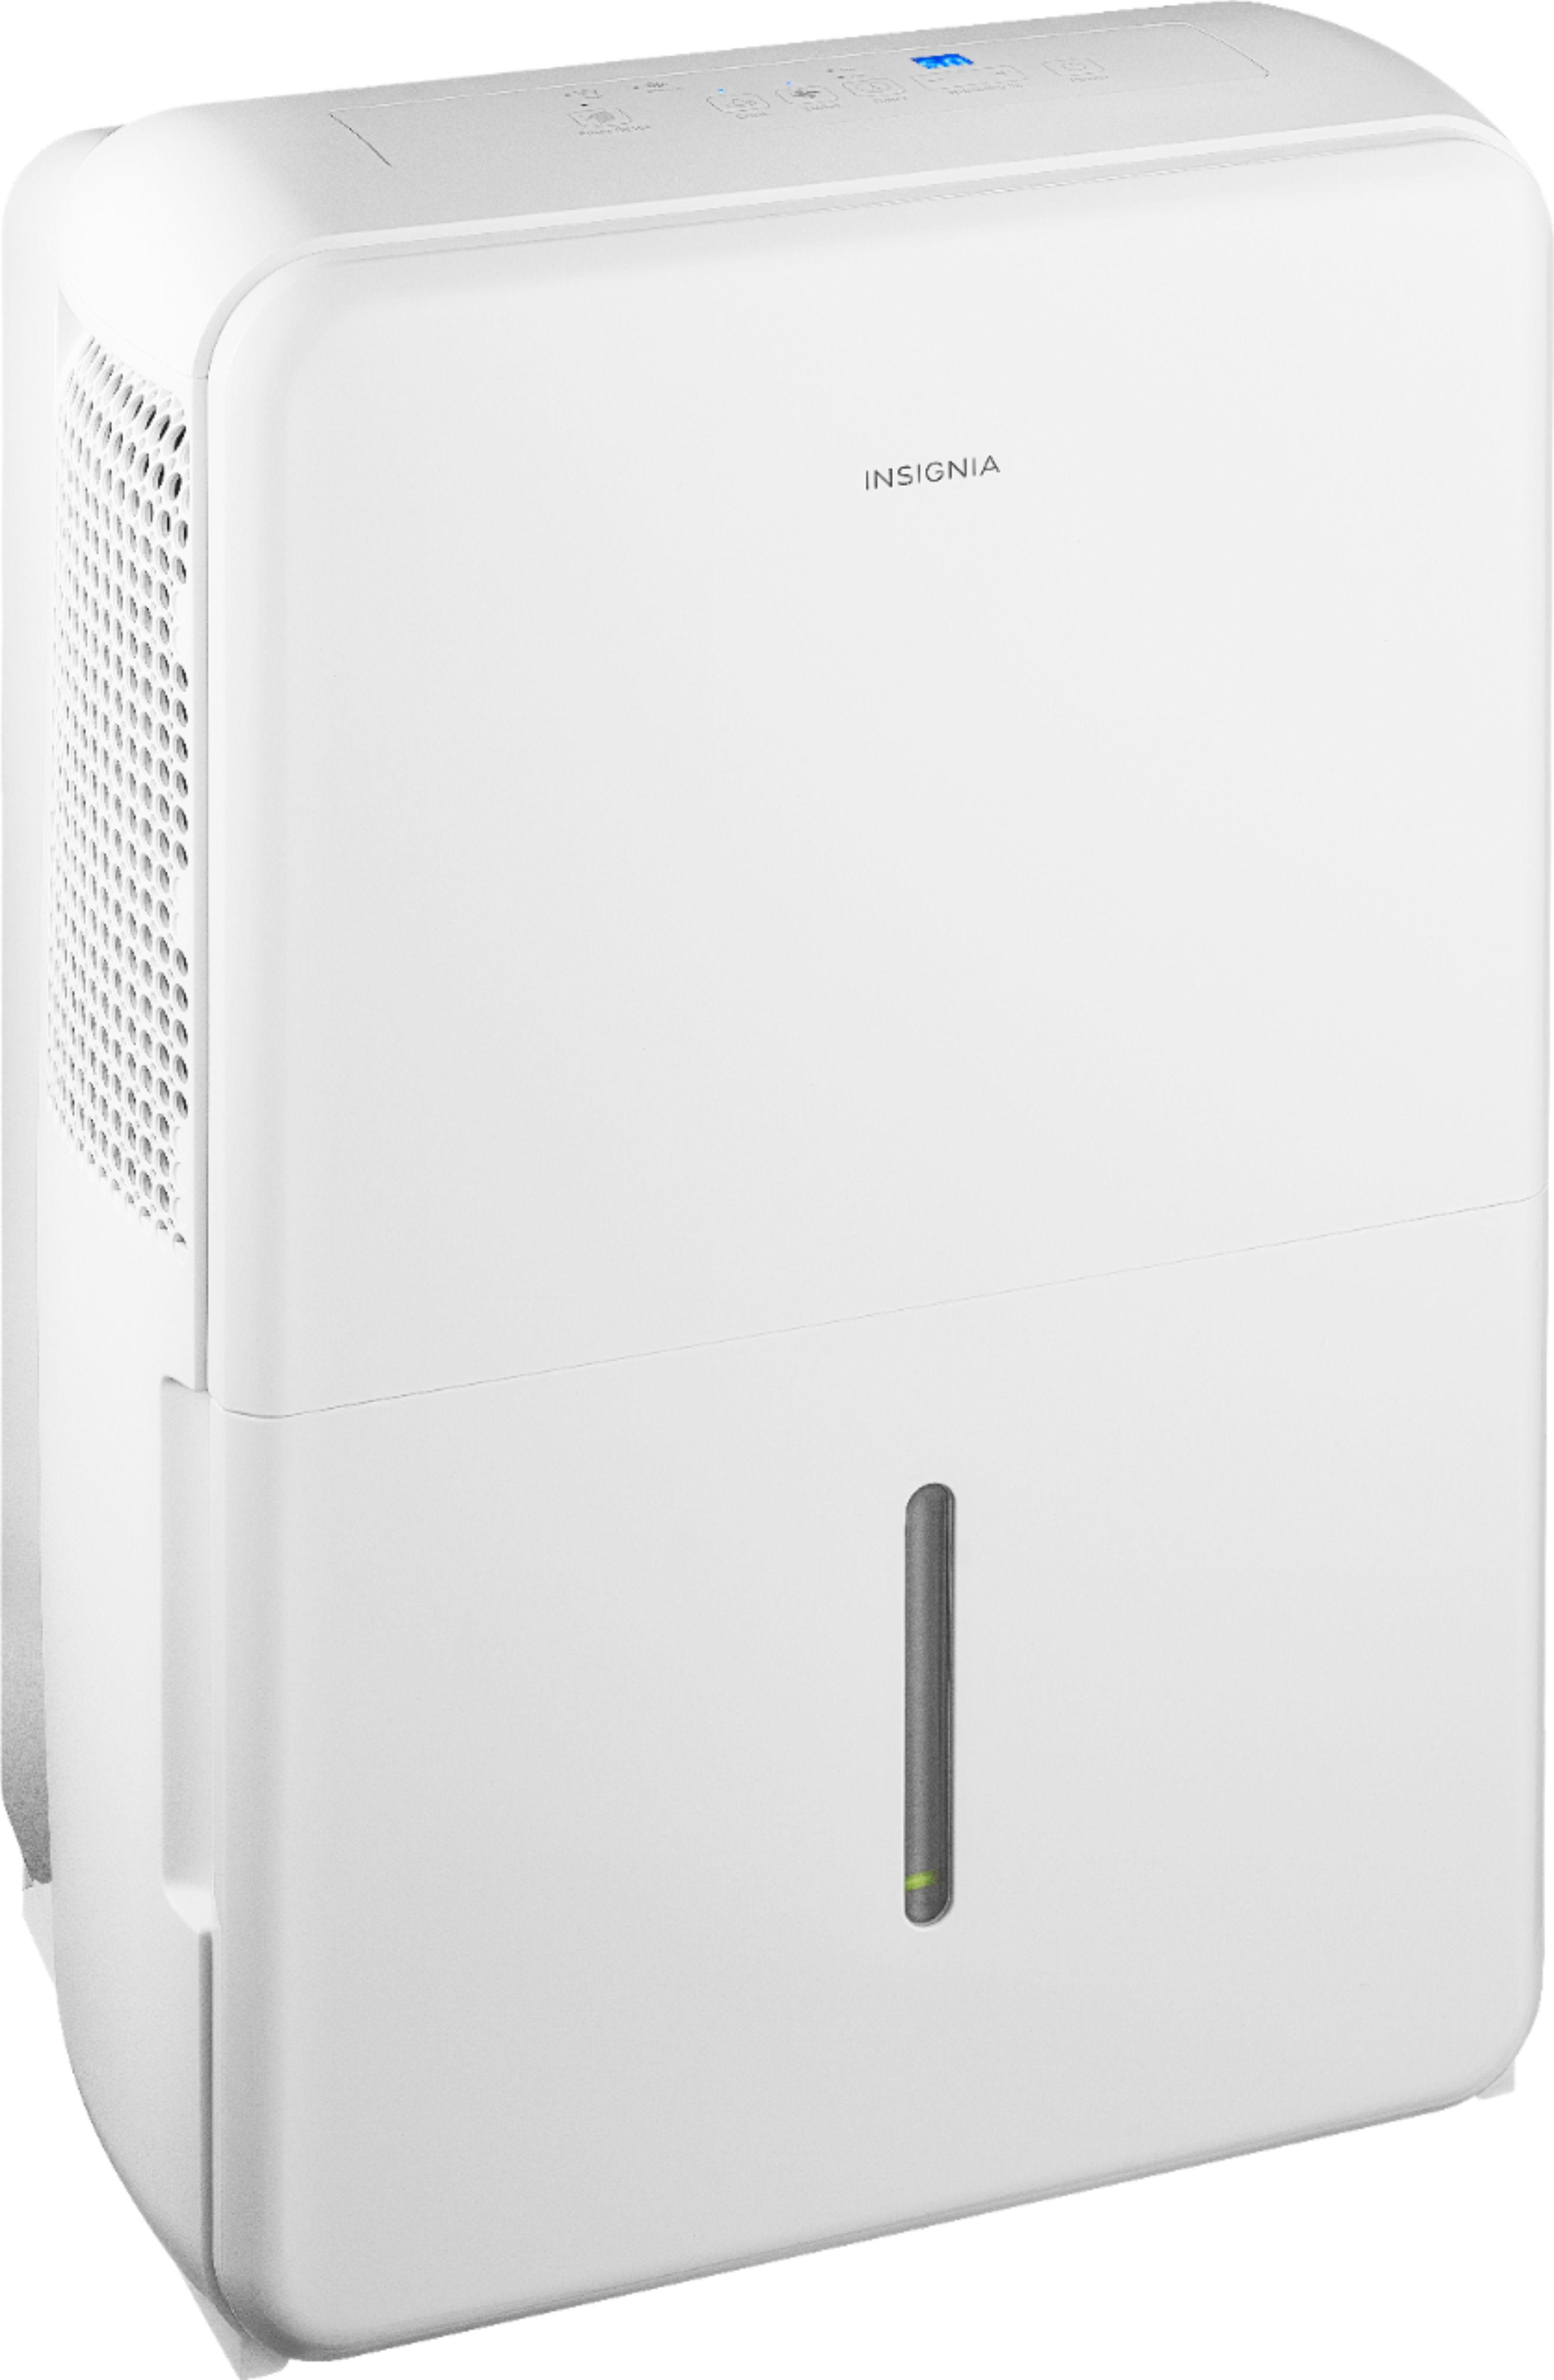 Insignia™ - 70-Pint Portable Dehumidifier - White $160